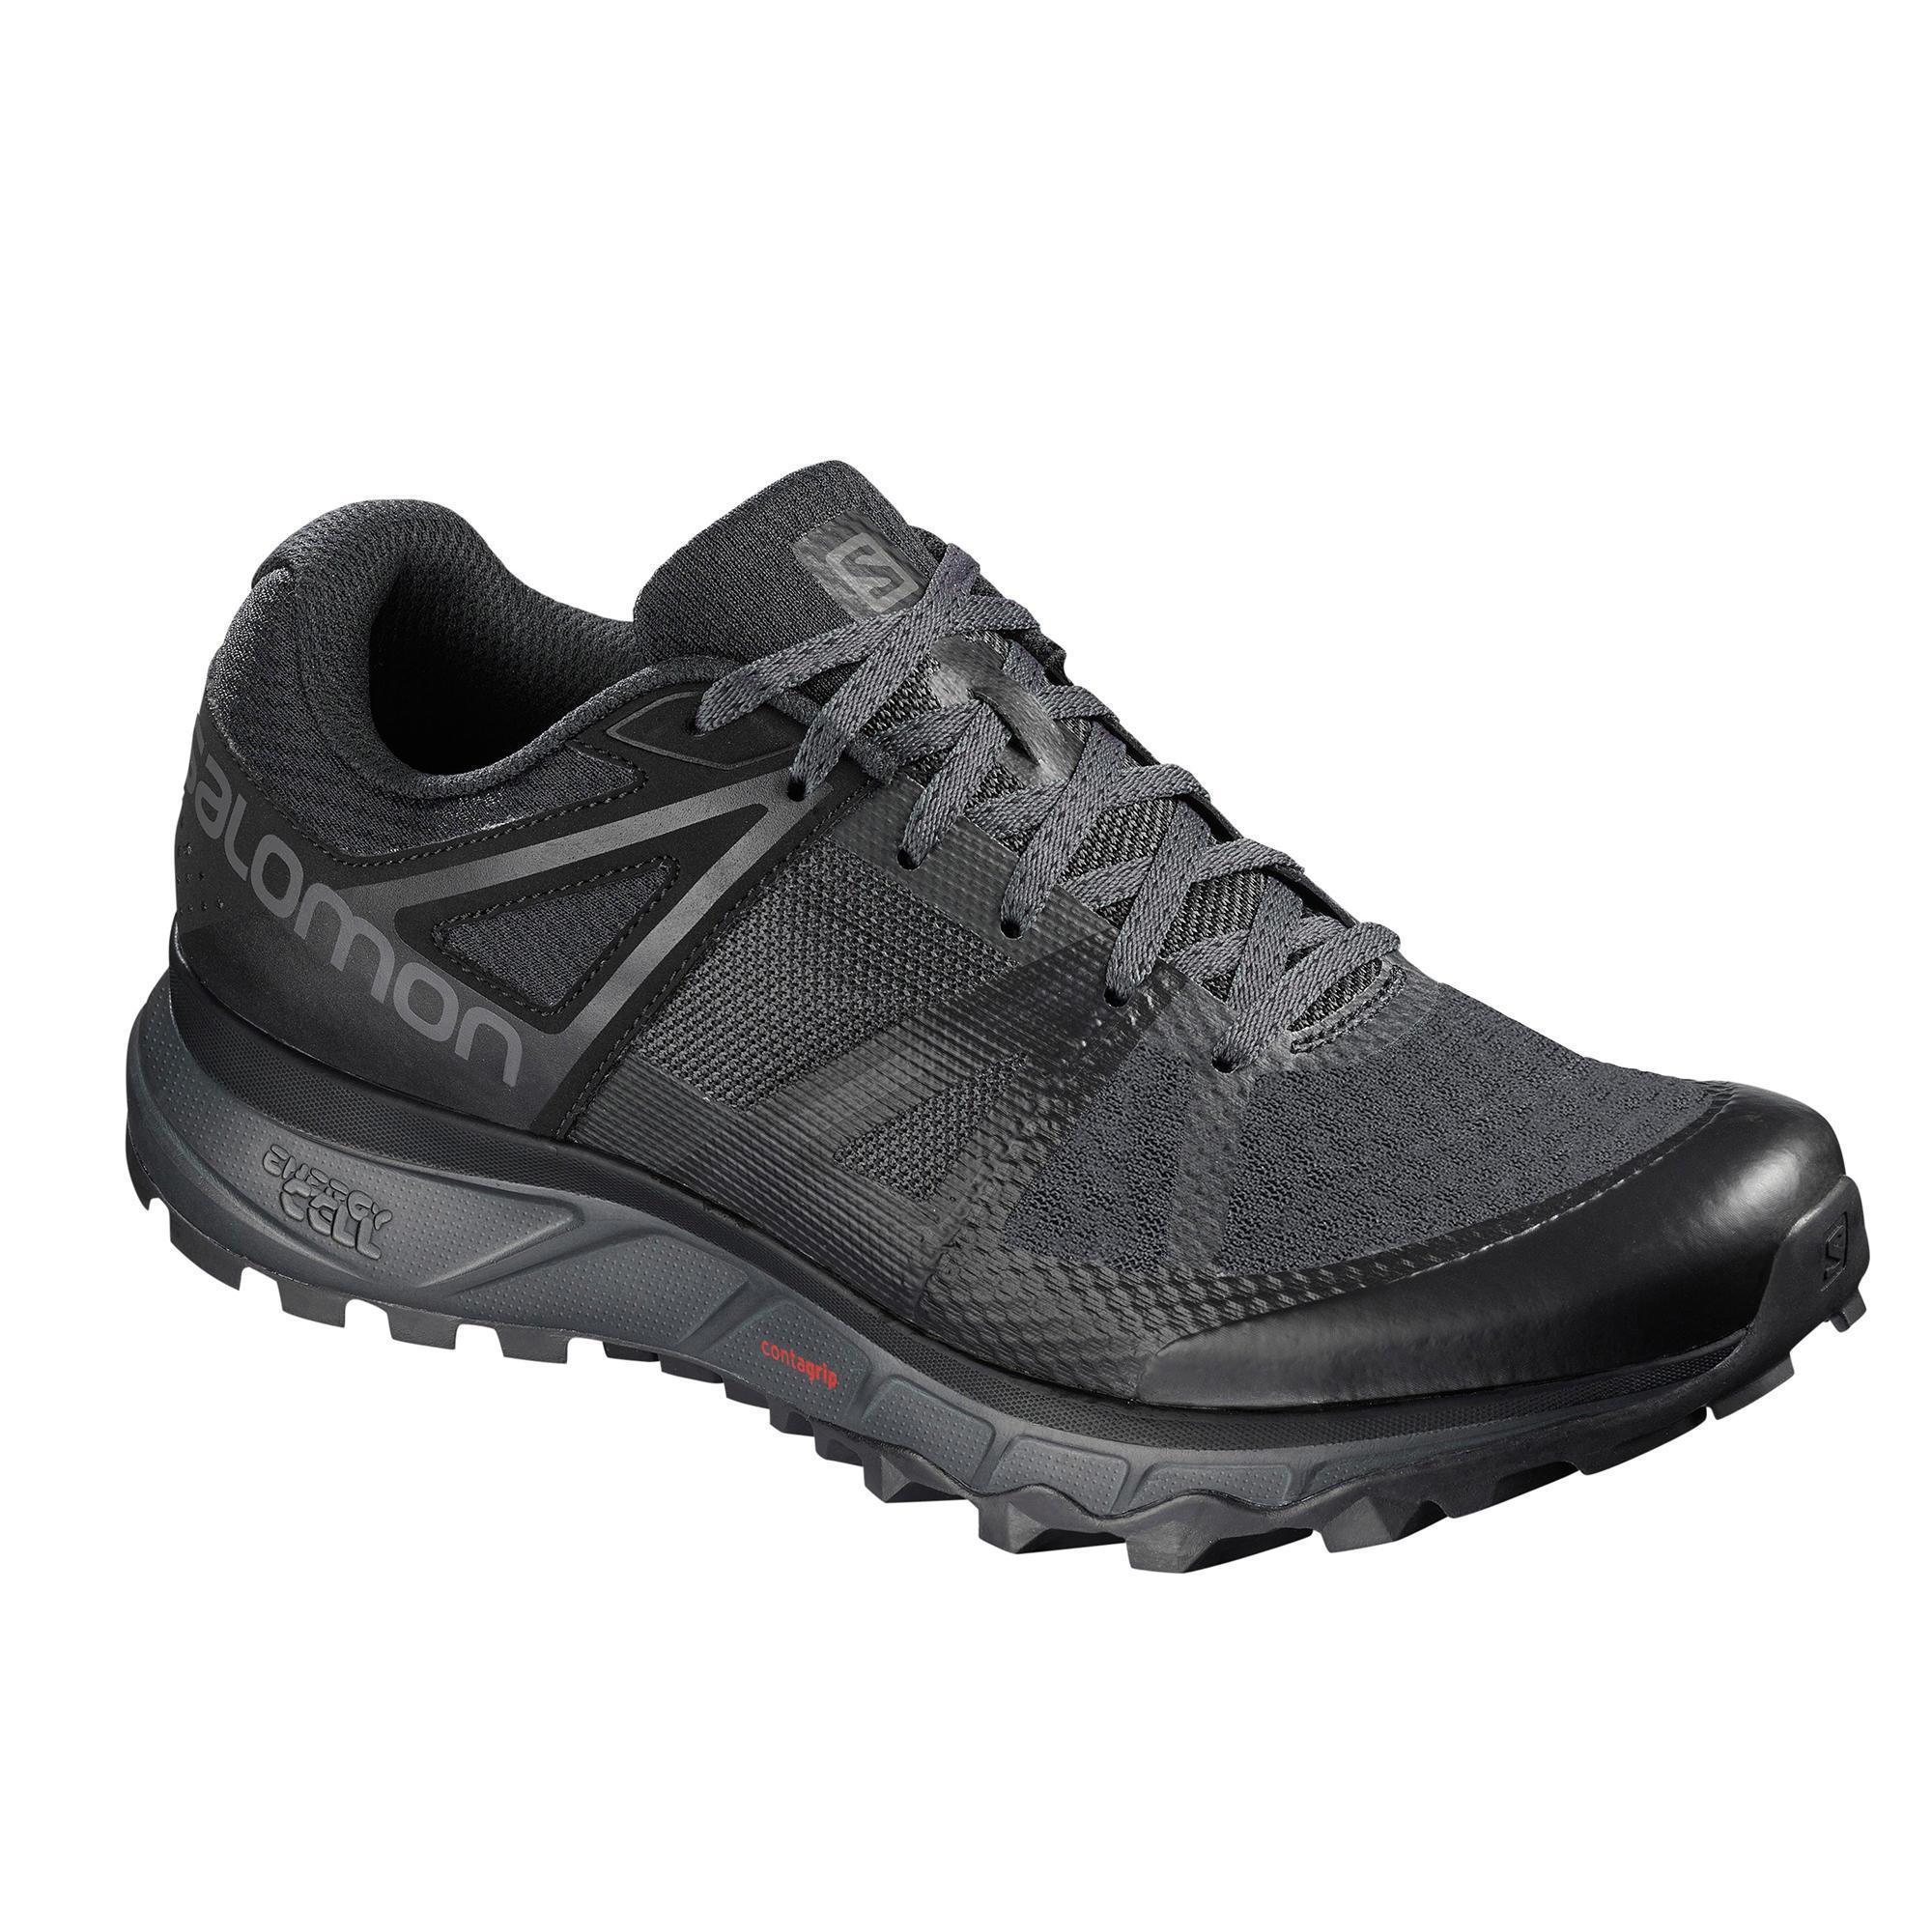 Salomon Trailster -  Zapatillas de Trail Running para Hombre